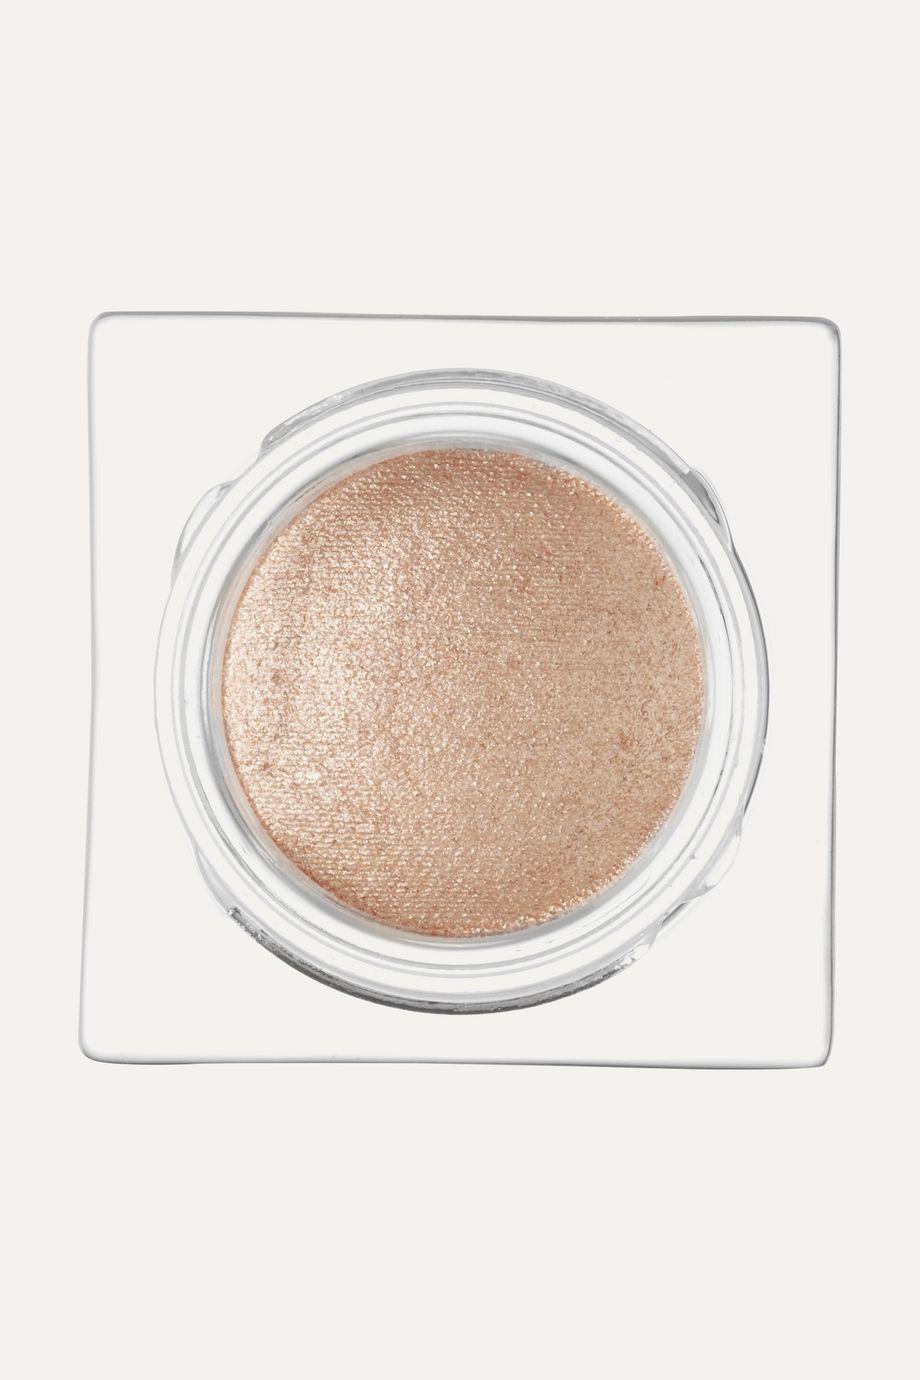 Burberry Beauty Eye Color Cream - Sheer Gold No.96